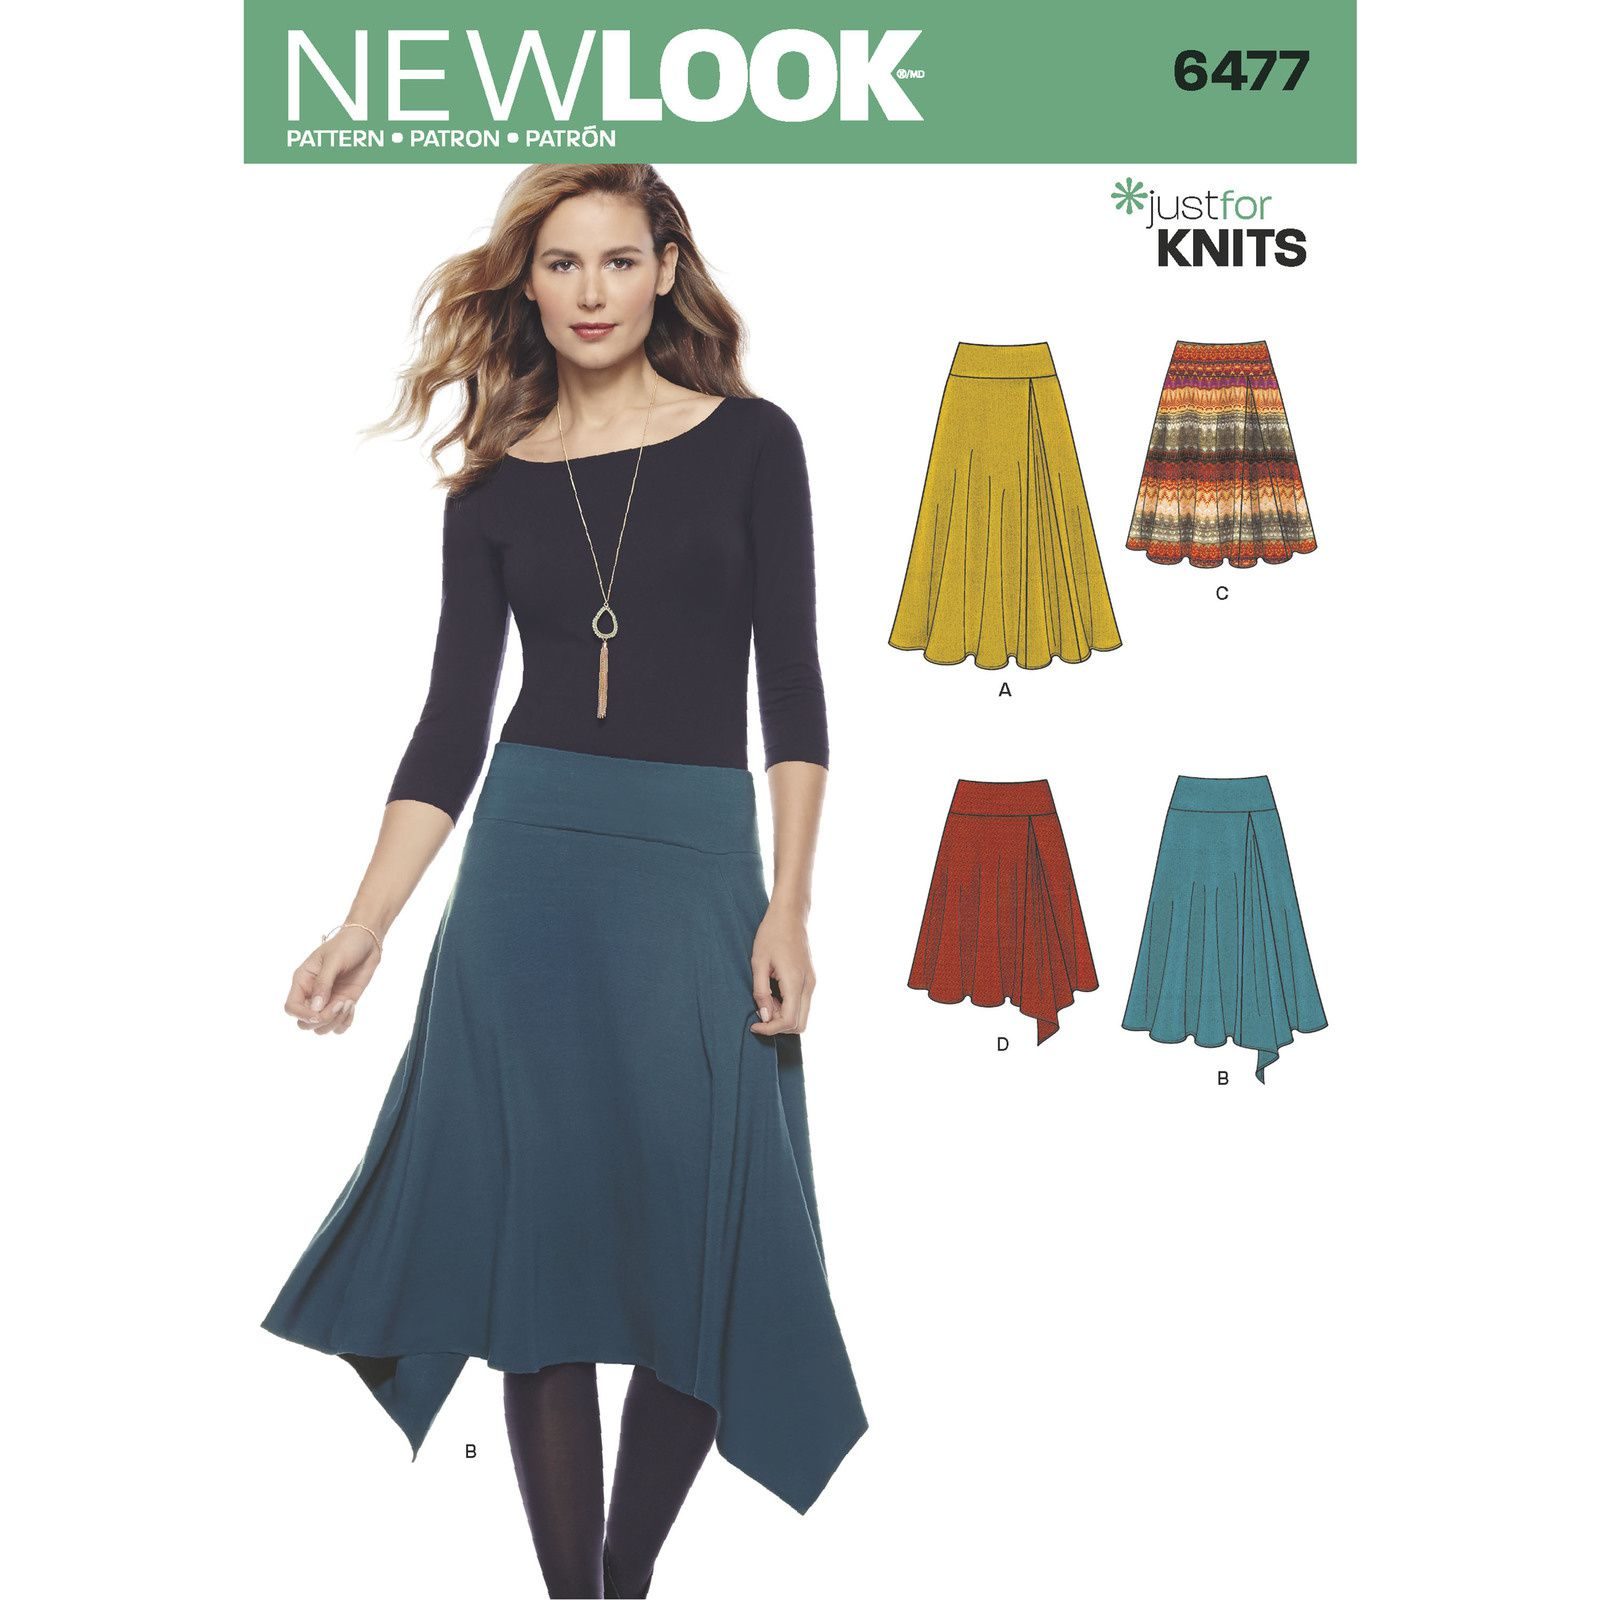 New Look 6477